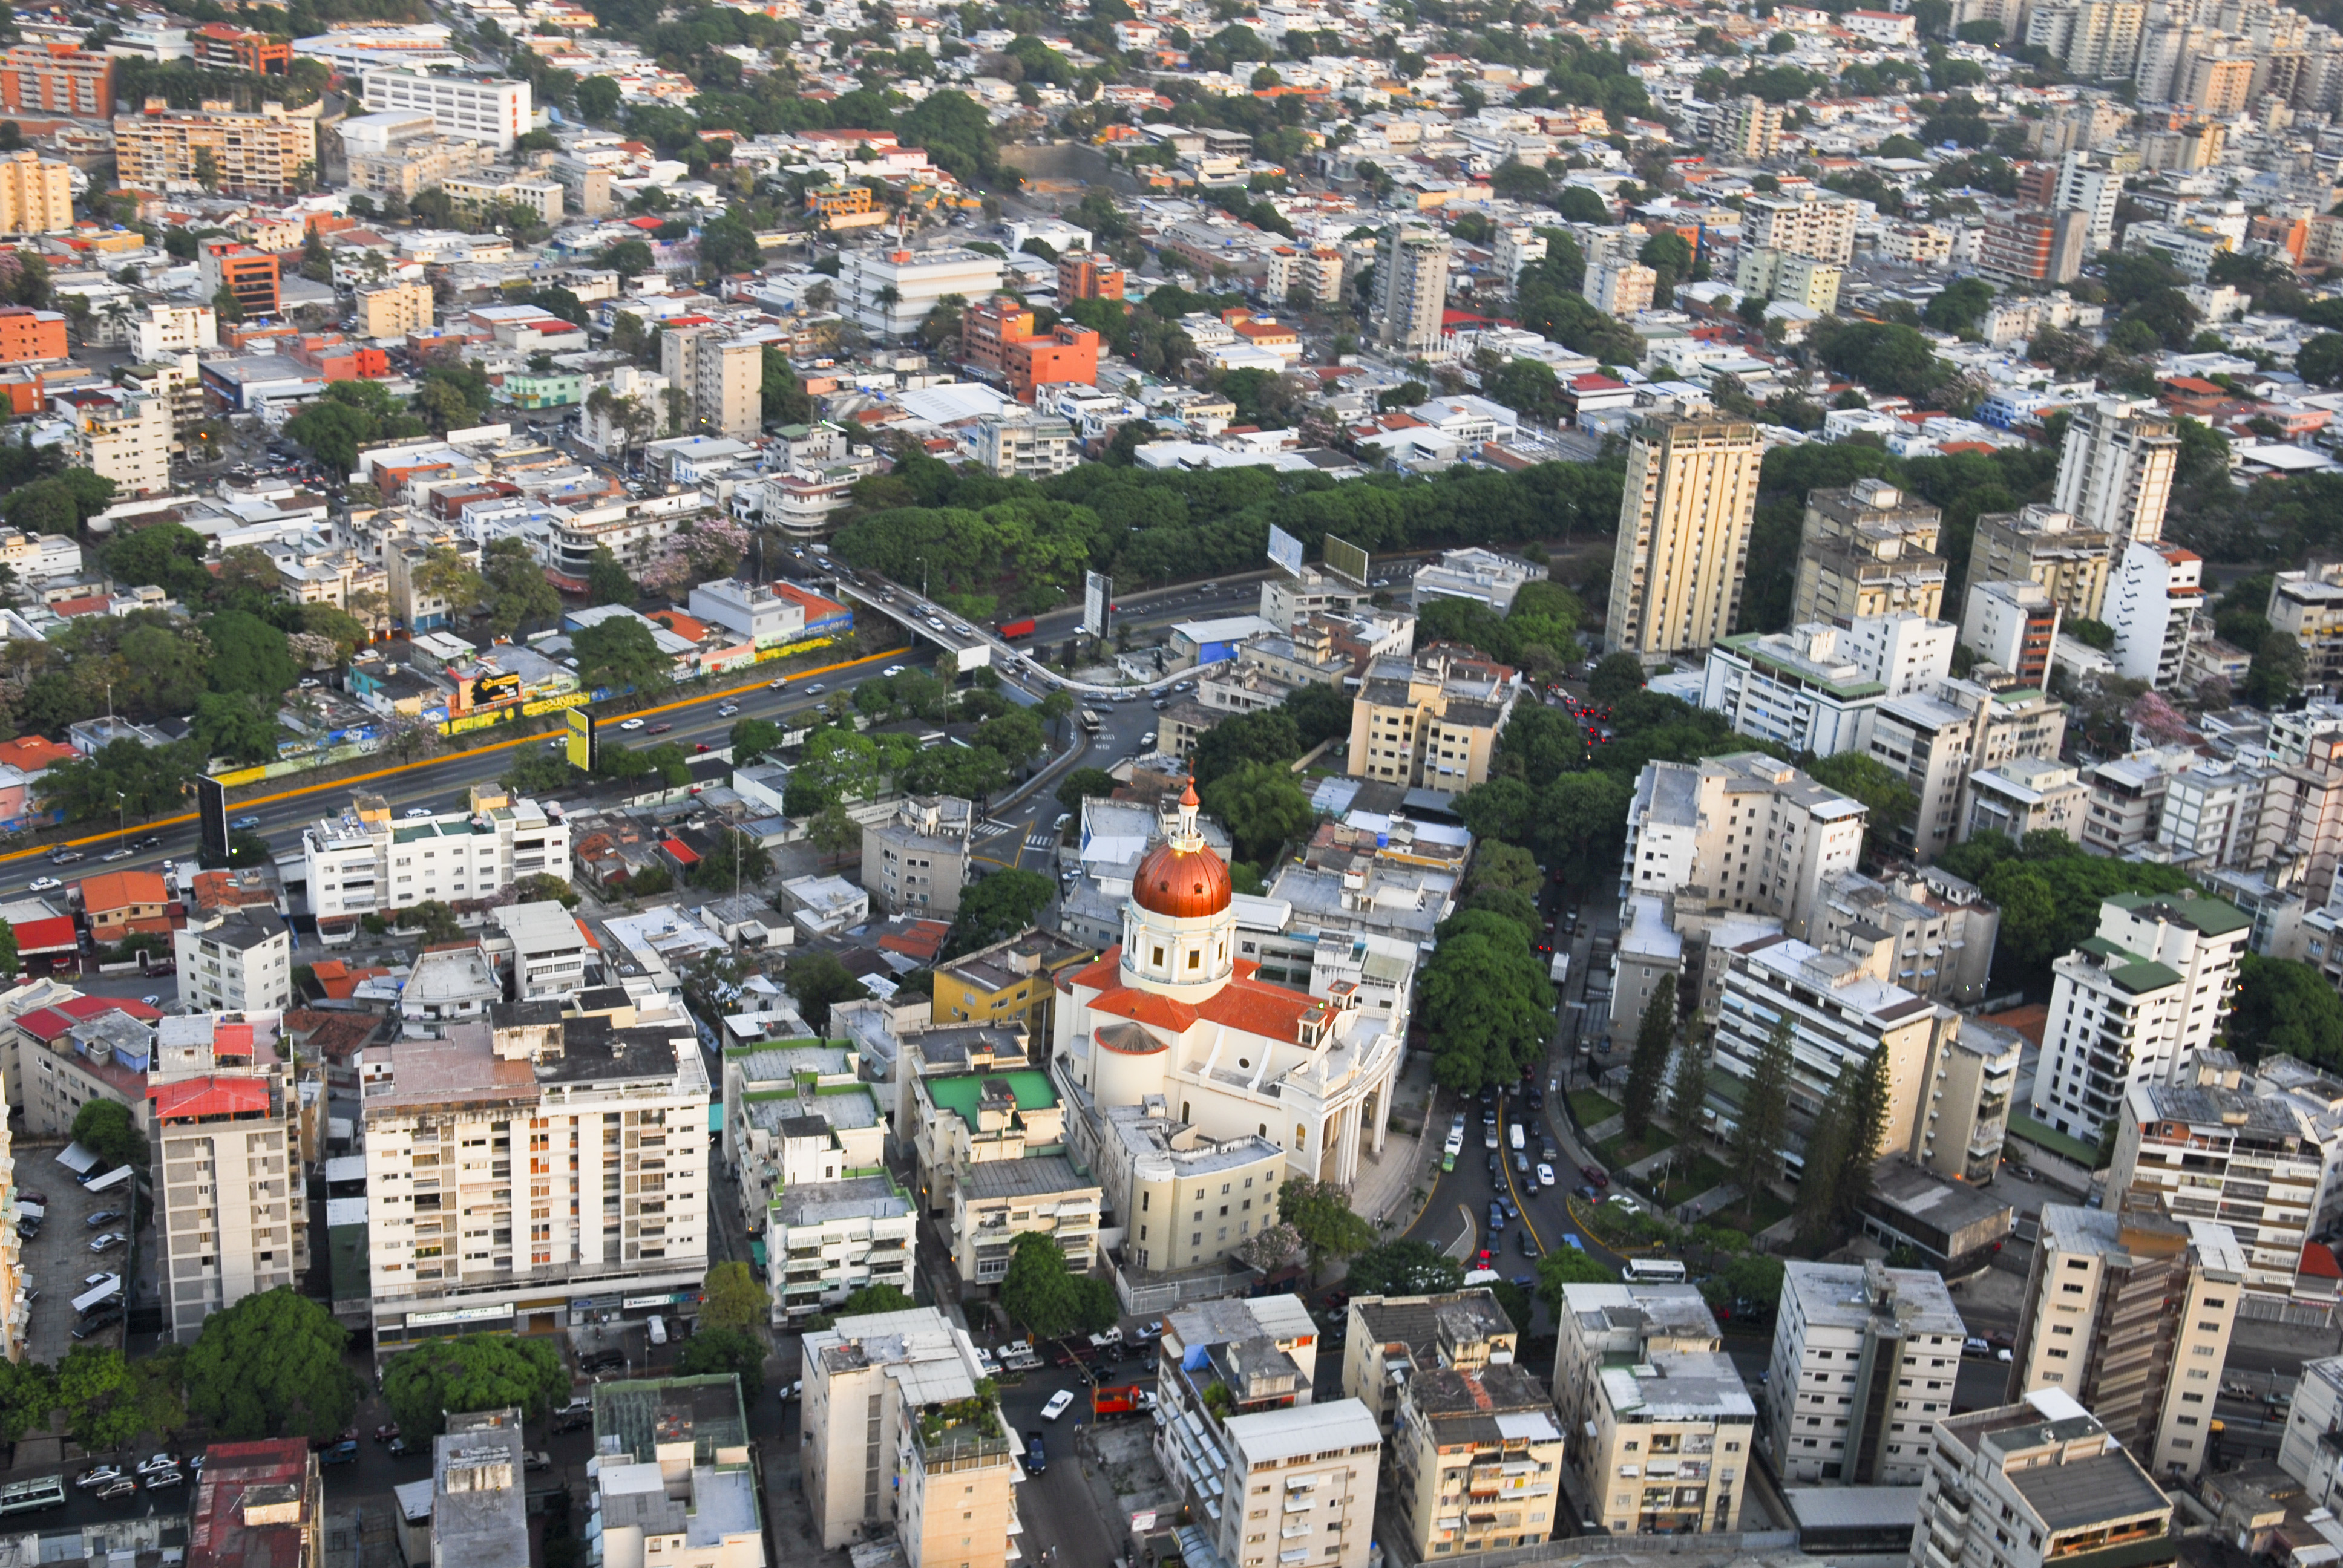 Galerry 35 incredible photos of Caracas Venezuela Places BOOMSbeat